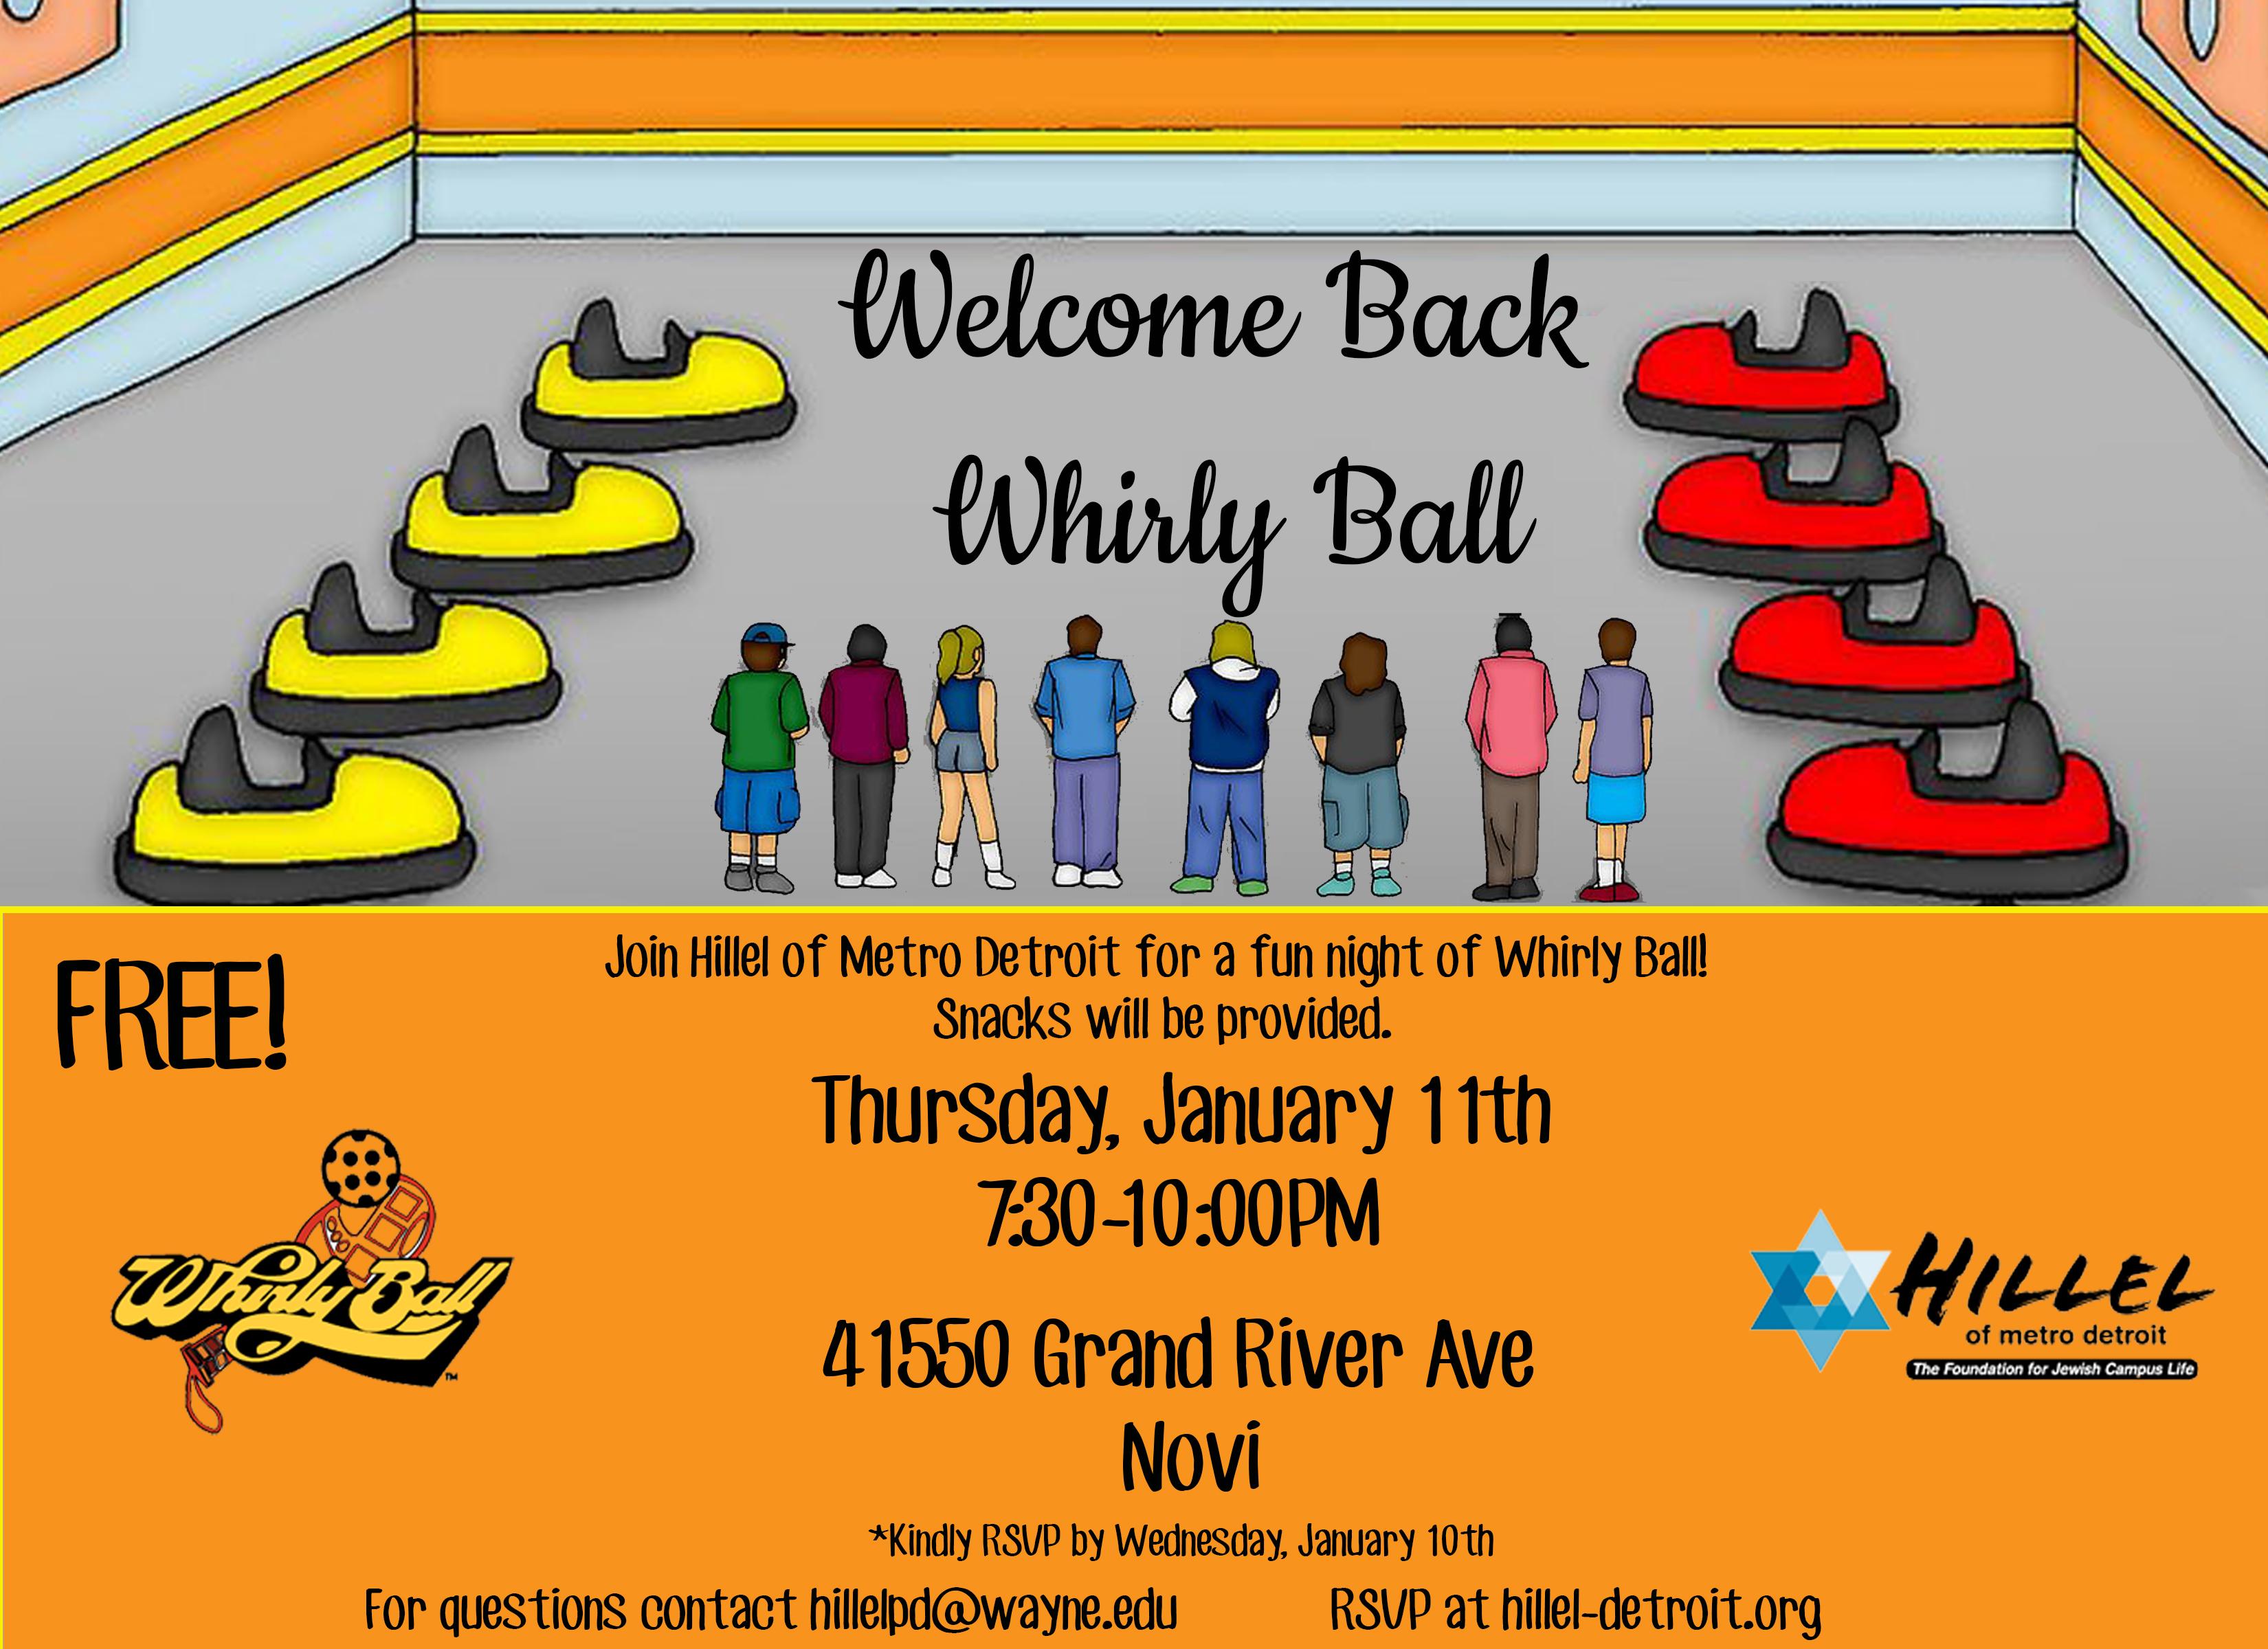 Welcome Back Whirlyball